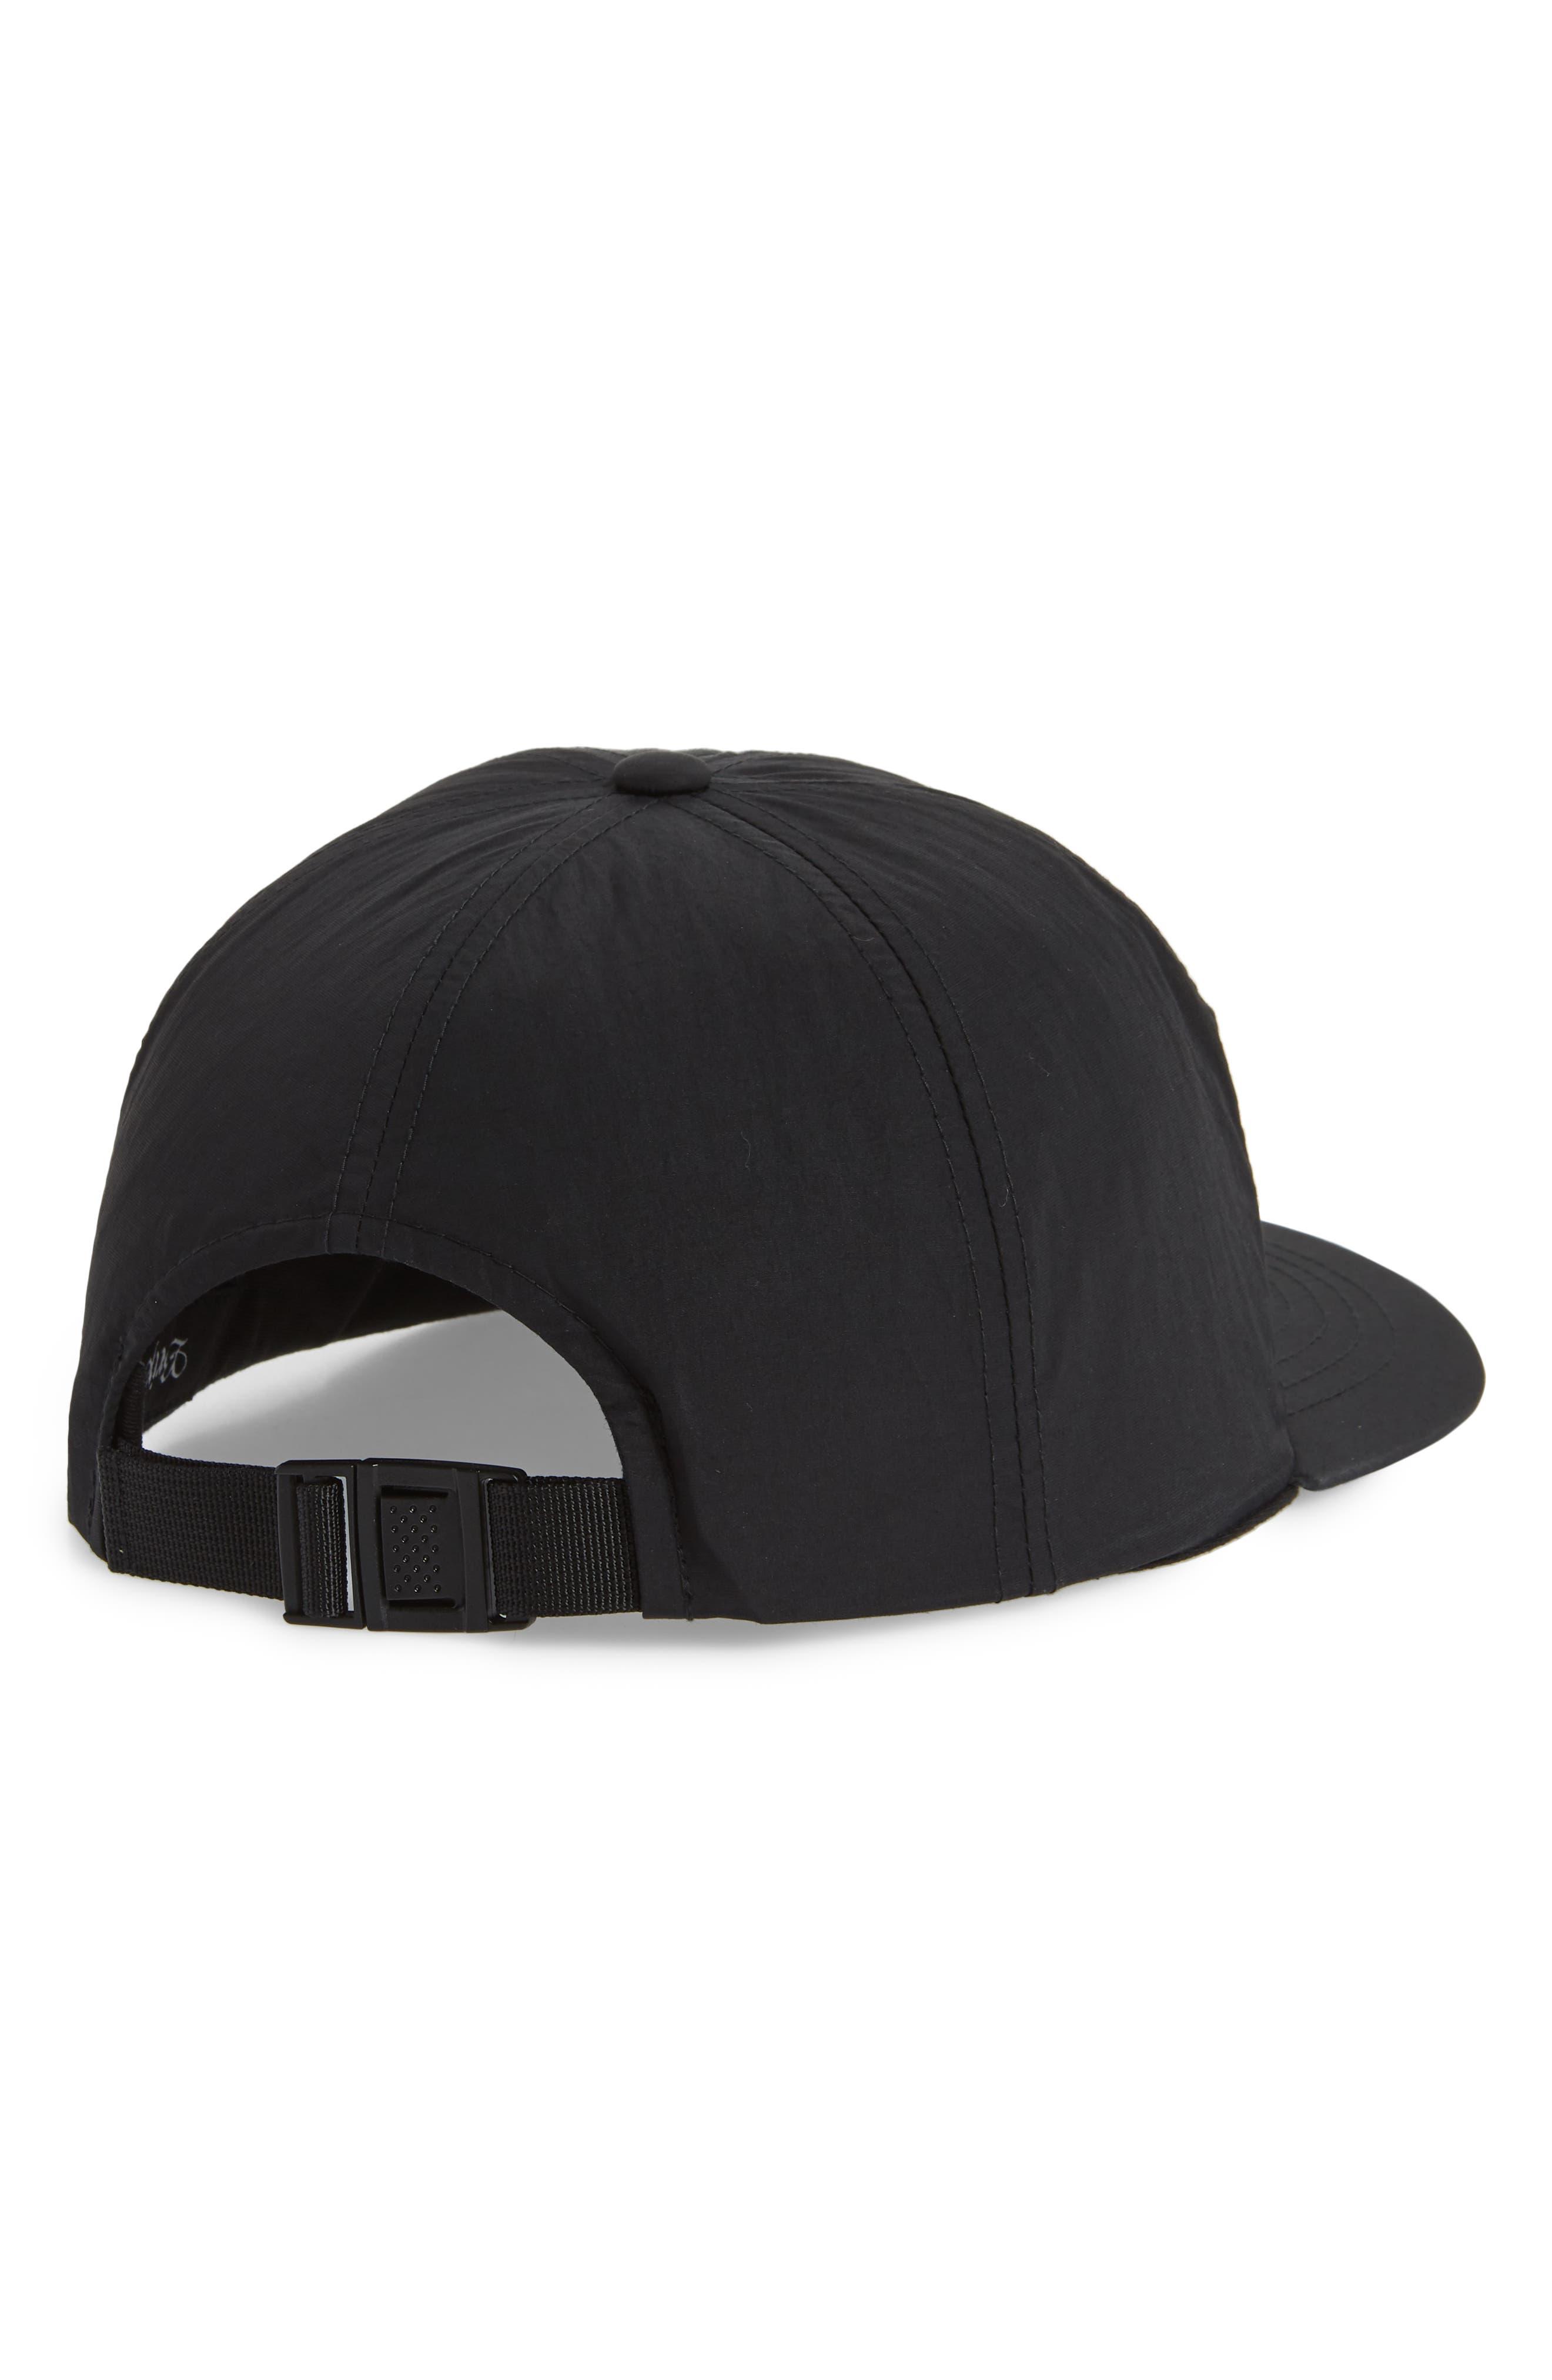 United Ball Cap,                             Alternate thumbnail 2, color,                             Black